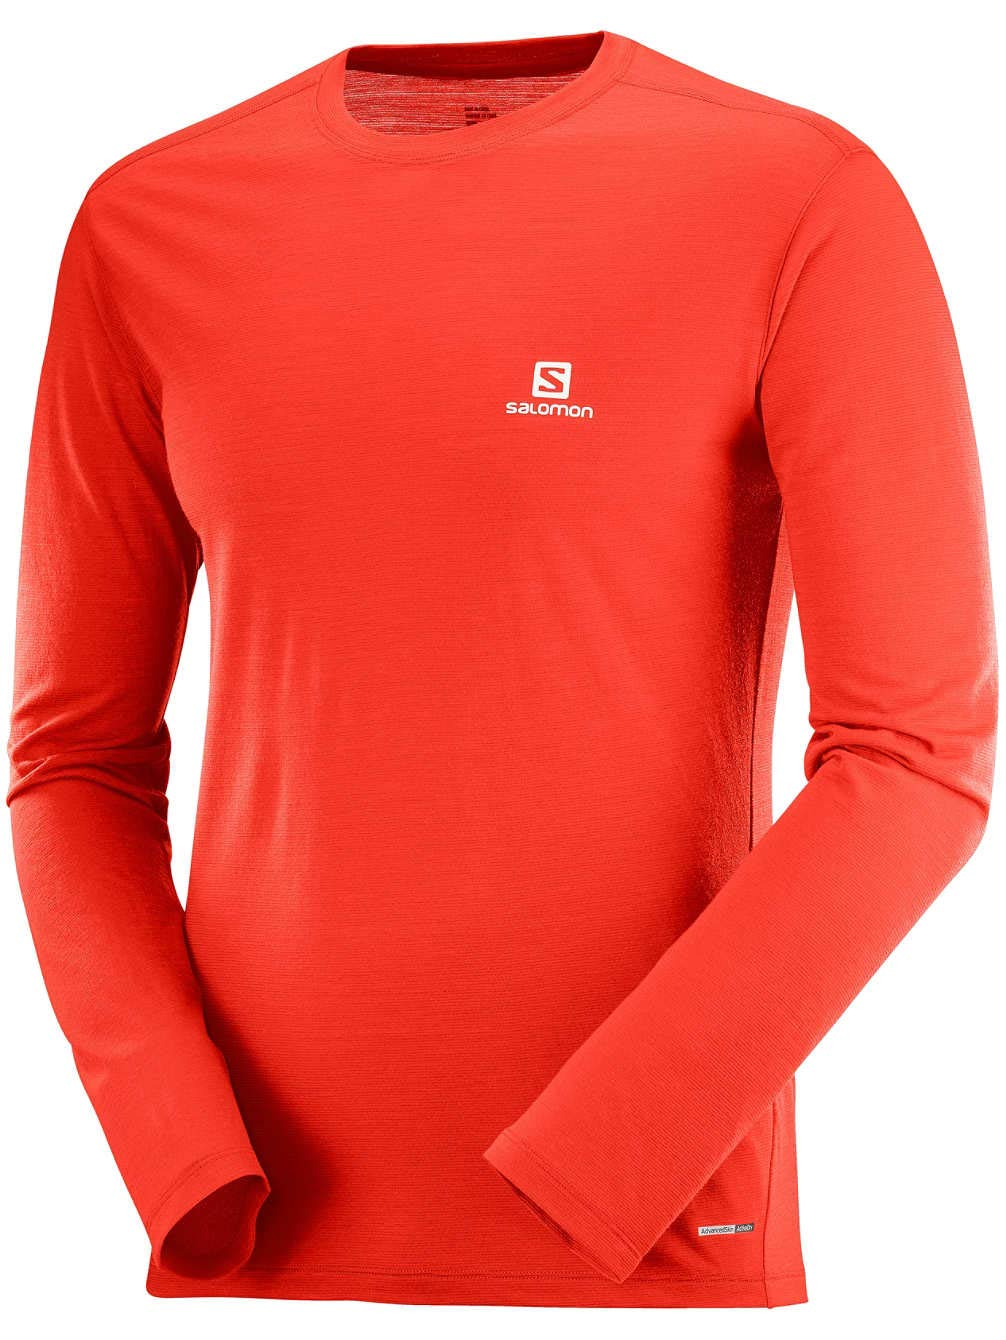 Hombre Rojo Salomon X Wool LS tee M Fiery Red Camiseta